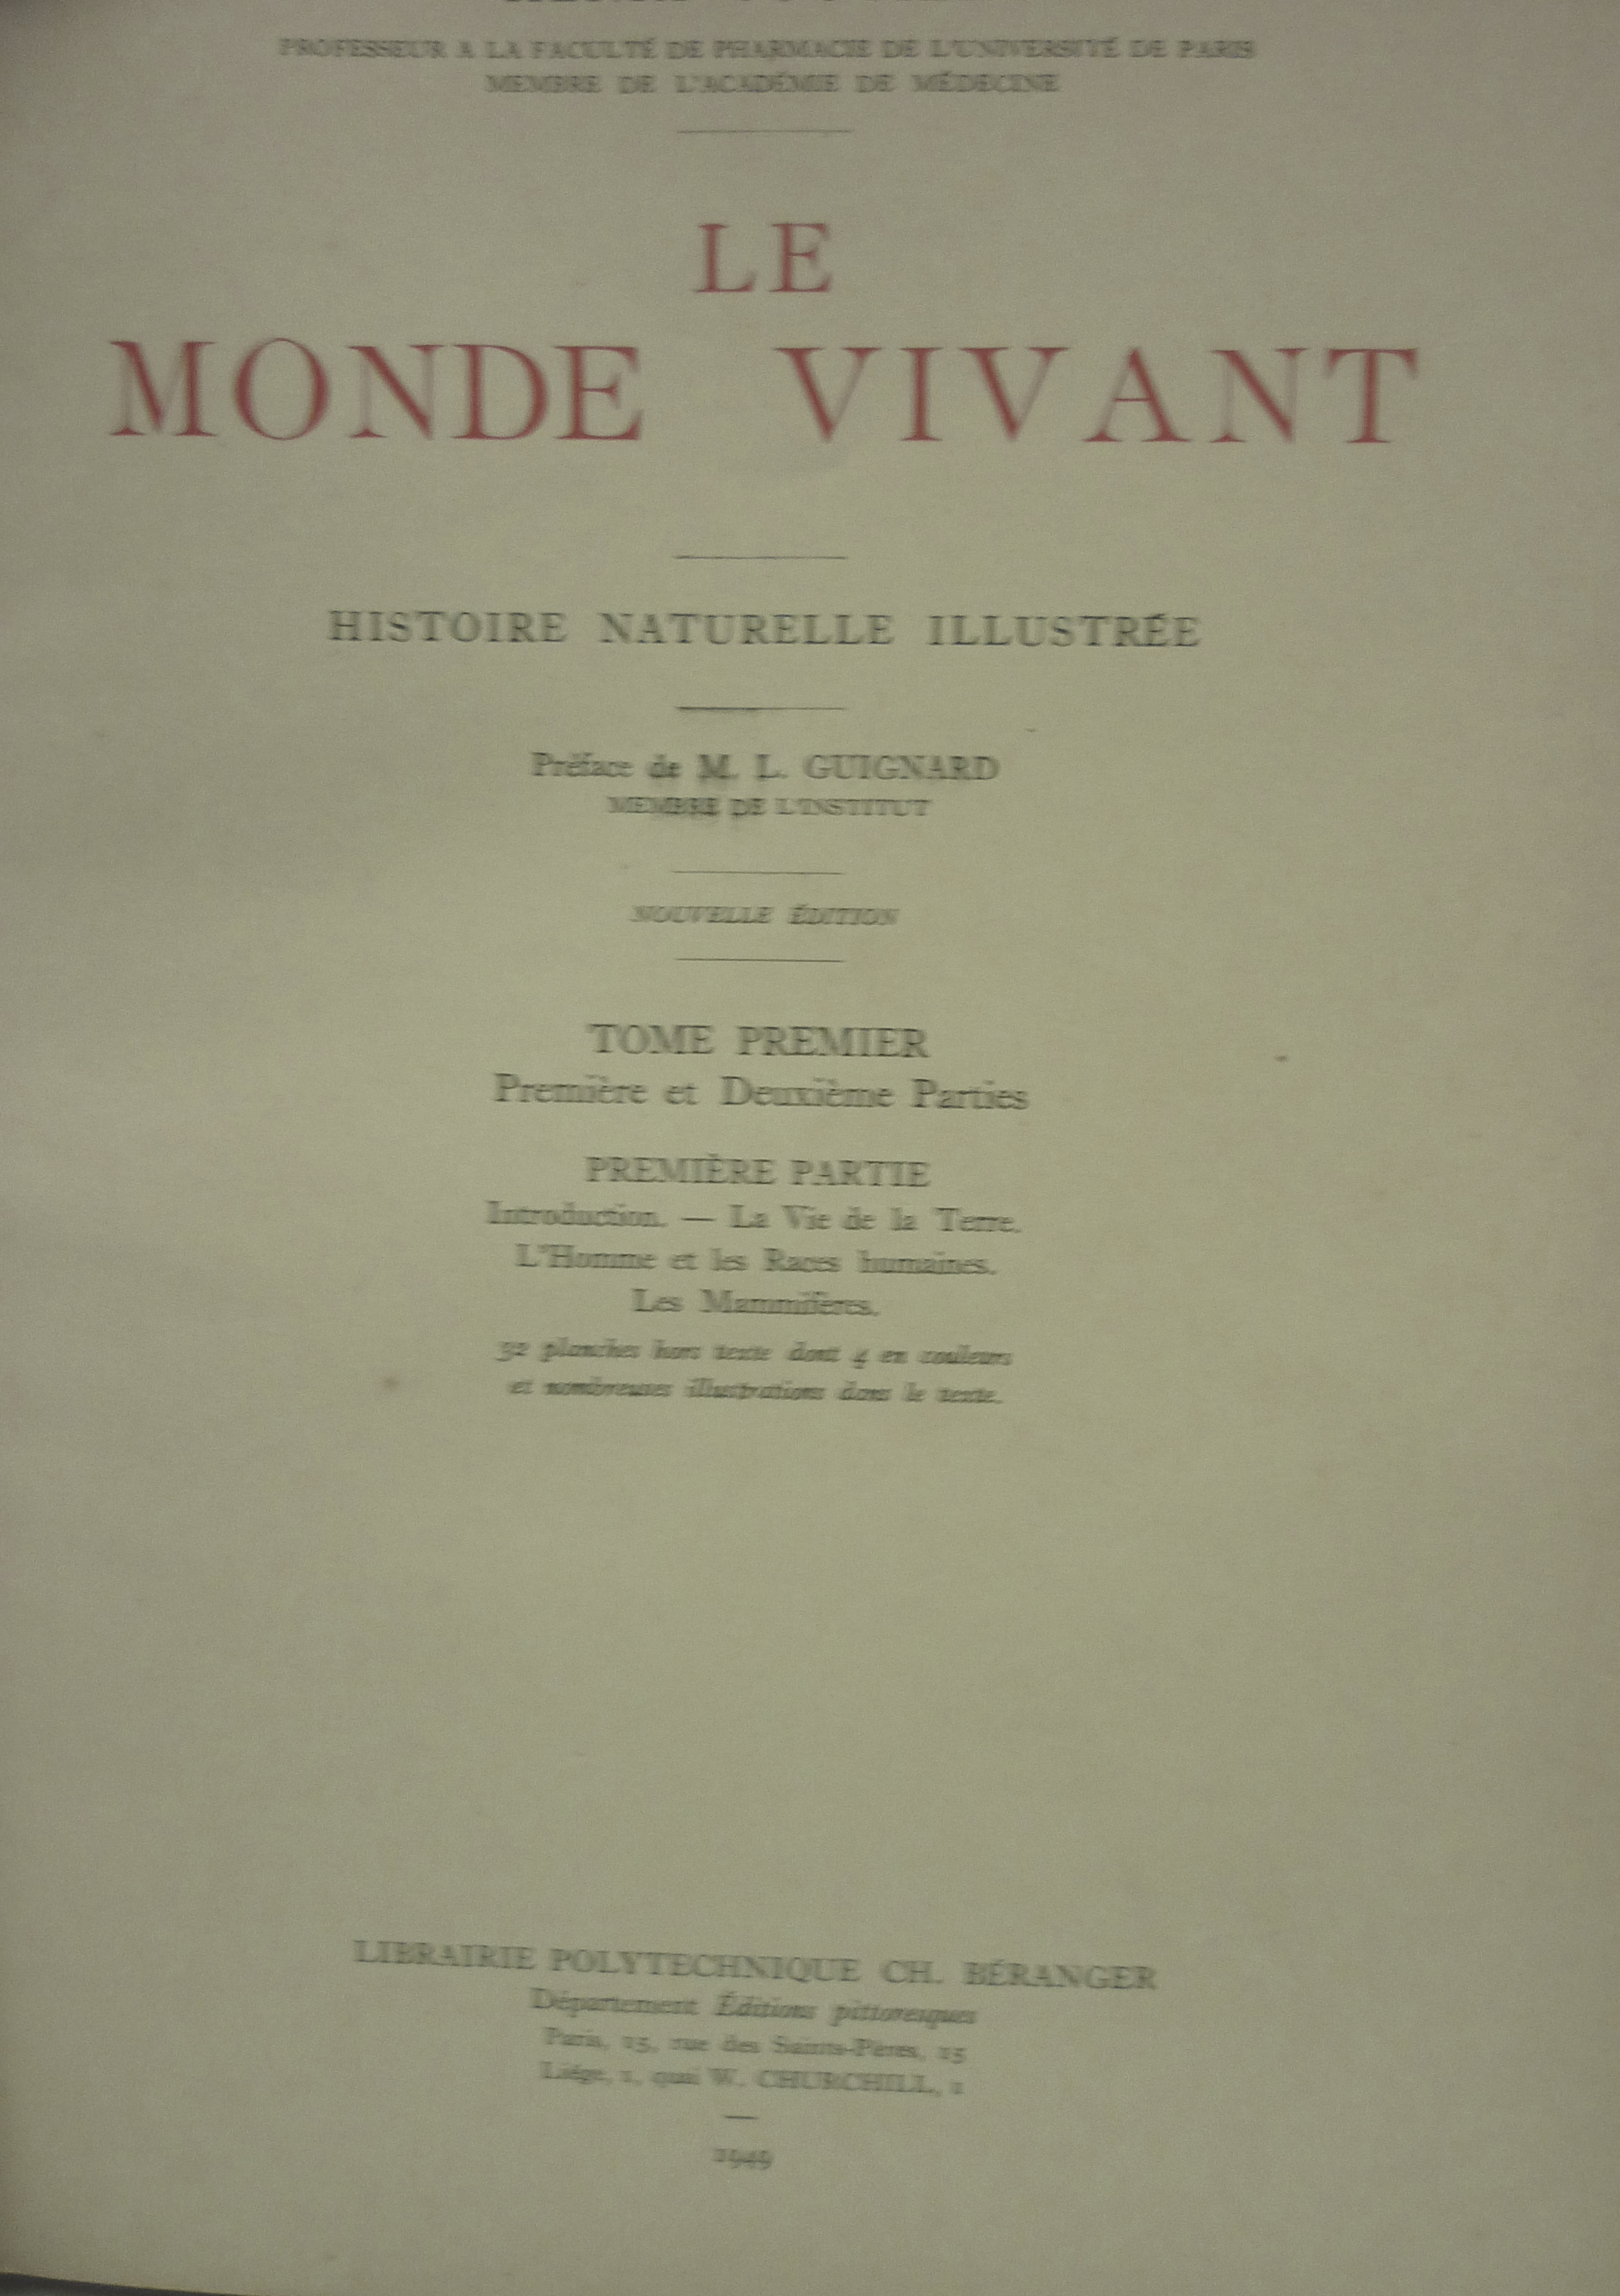 Le Monde Vivant - 3 Tomos